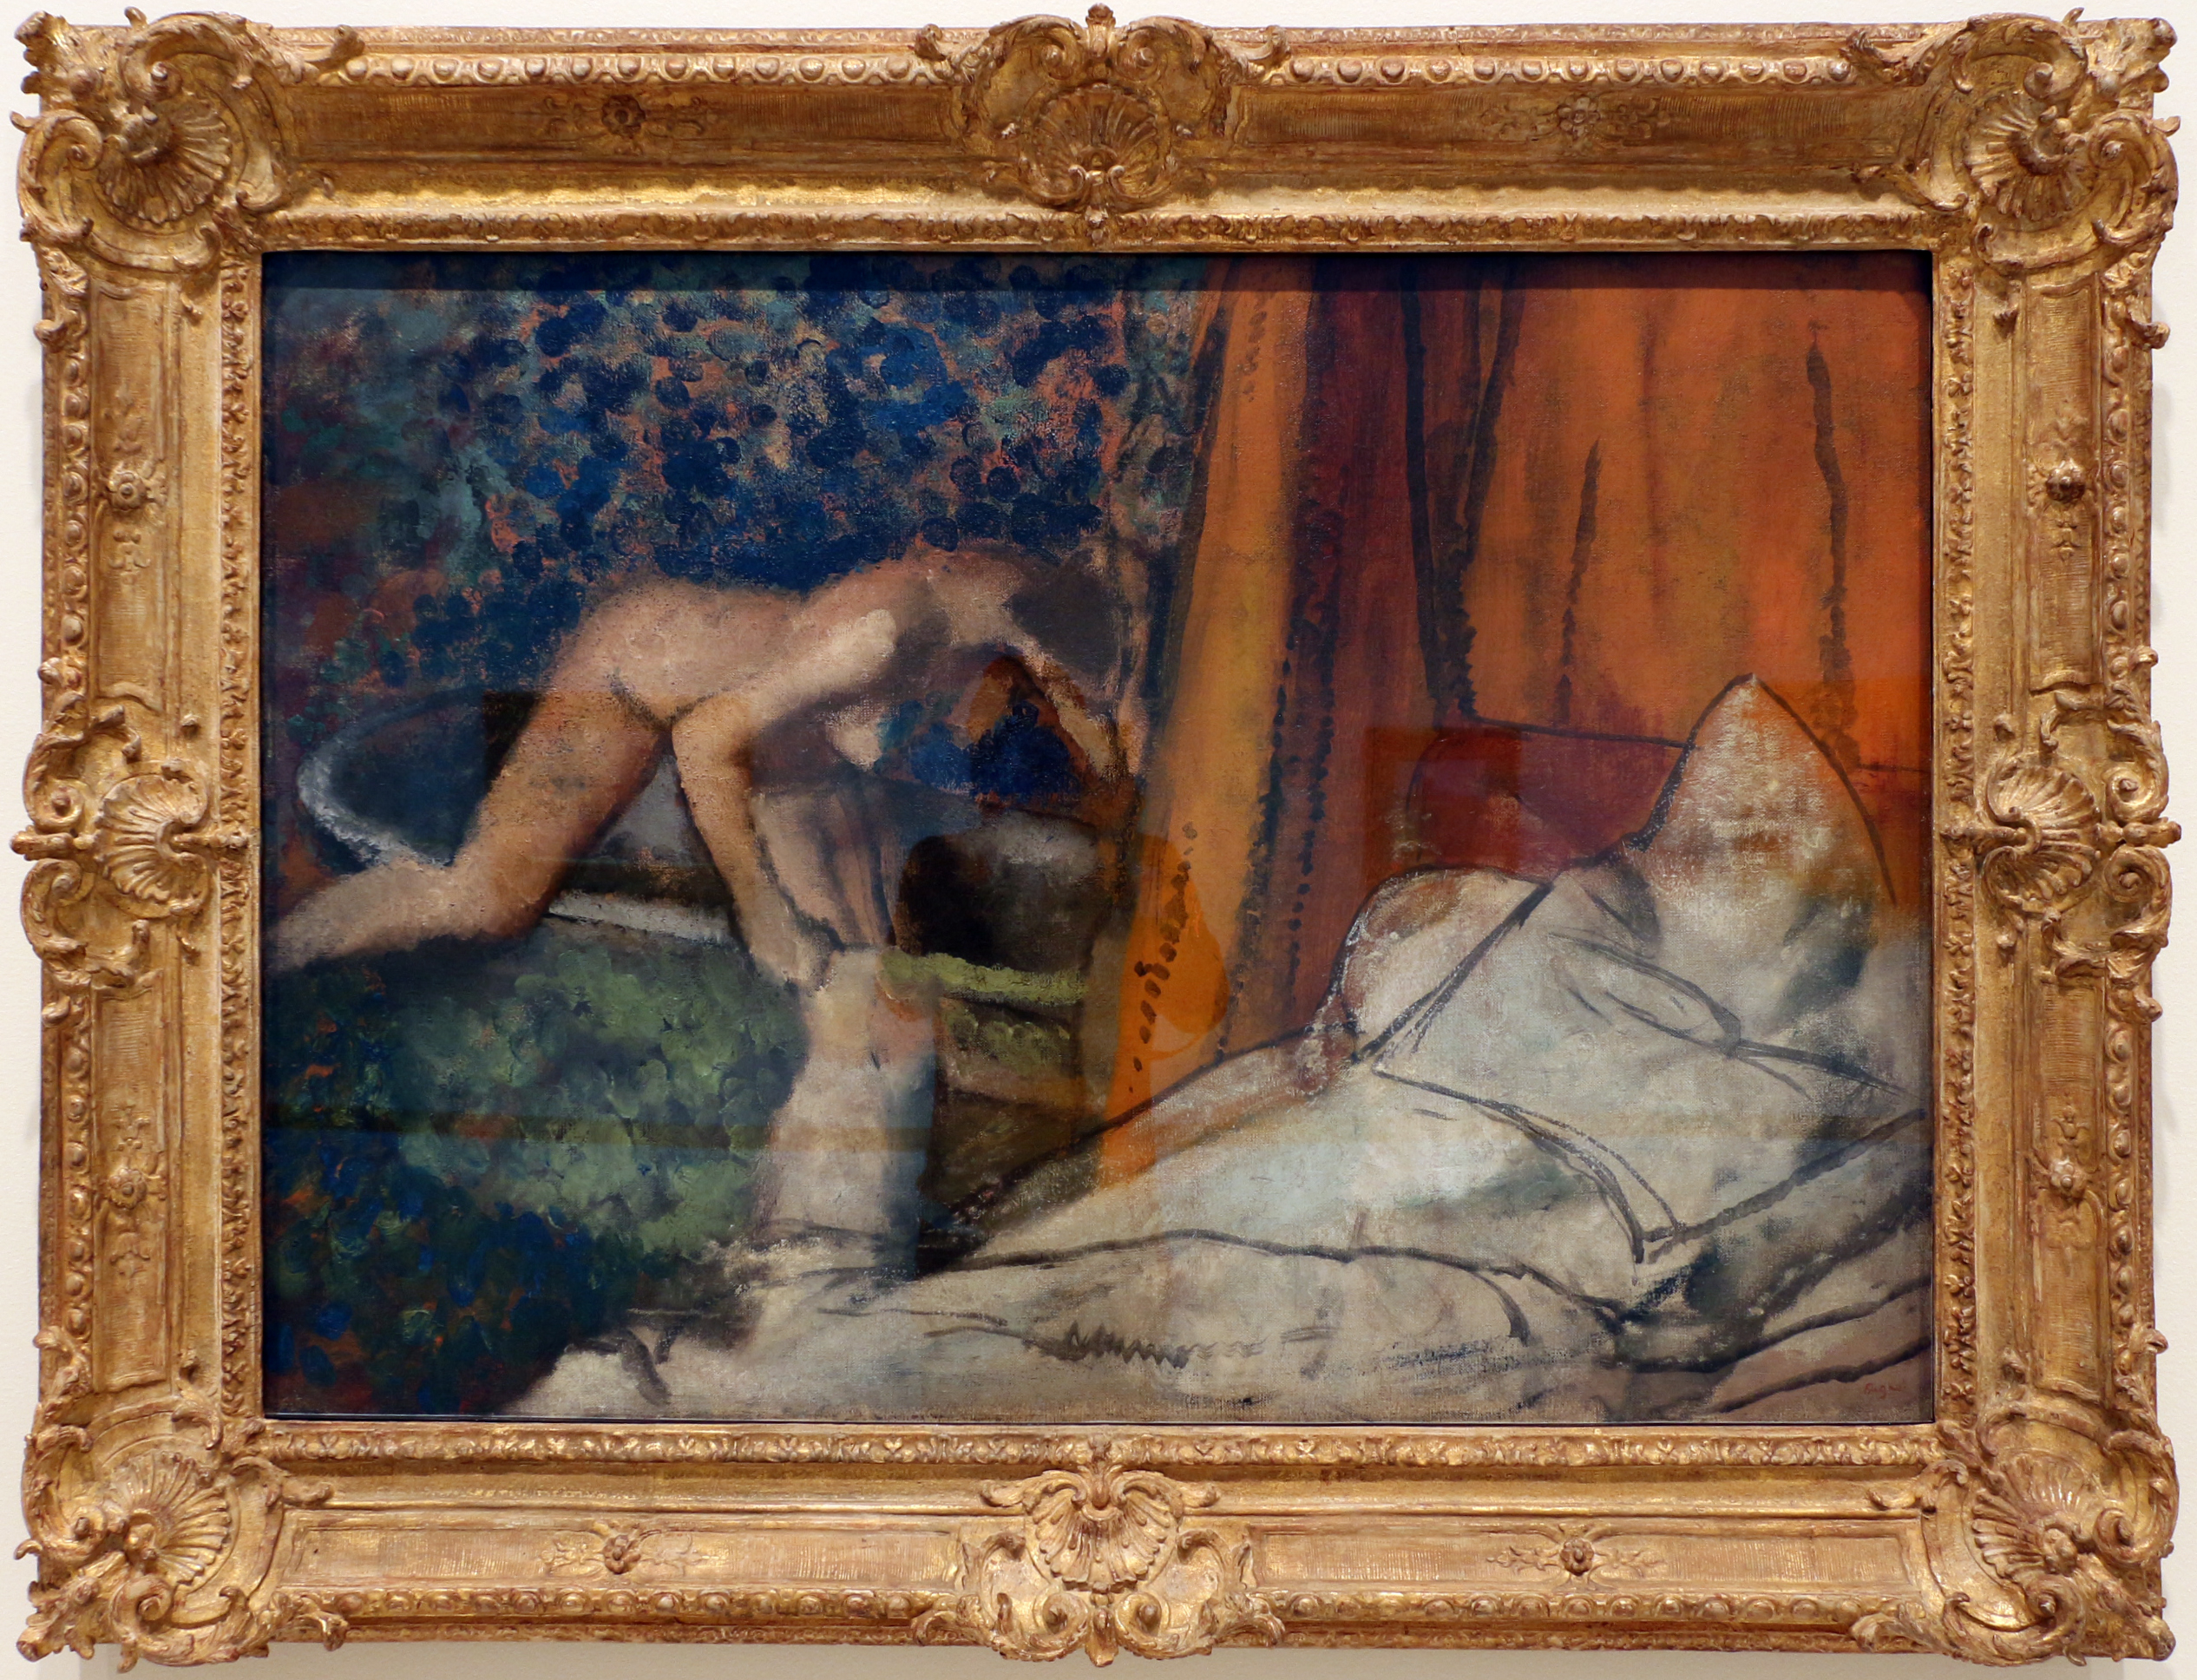 File:Hilaire-germain-edgar degas, il bagno, 1895 ca.jpg - Wikimedia Commons